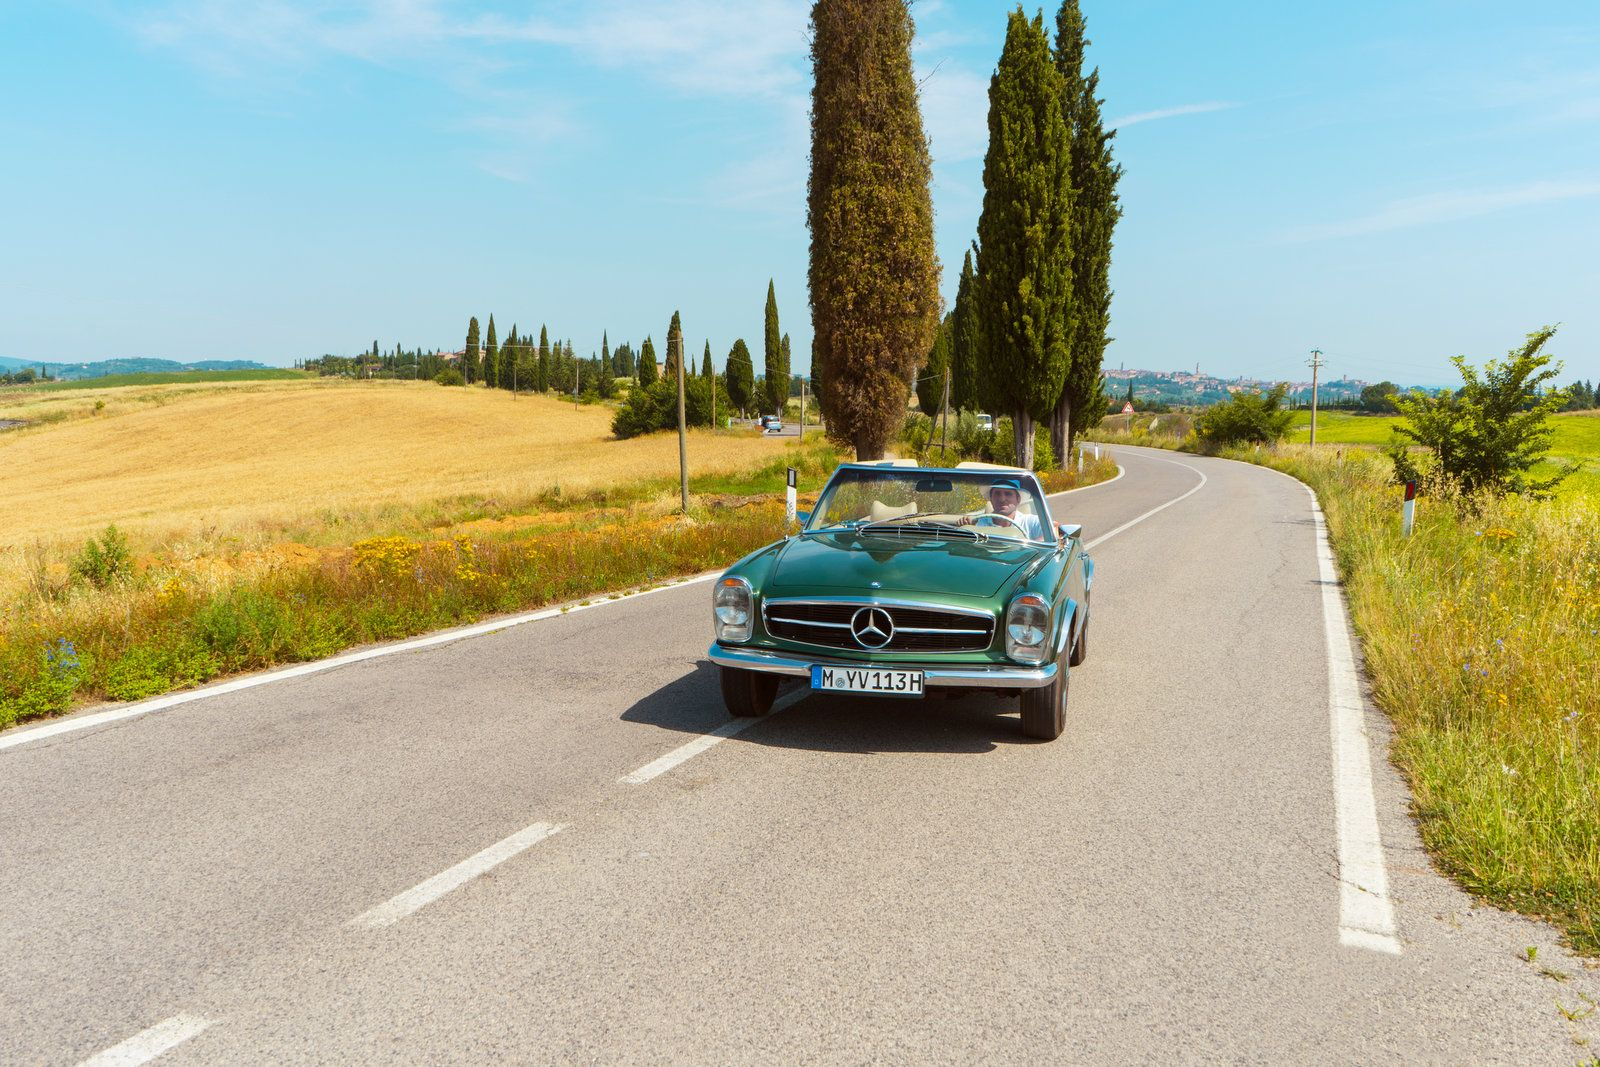 Mercedes-Benz W113 | Nostalgic Classic Car Travel